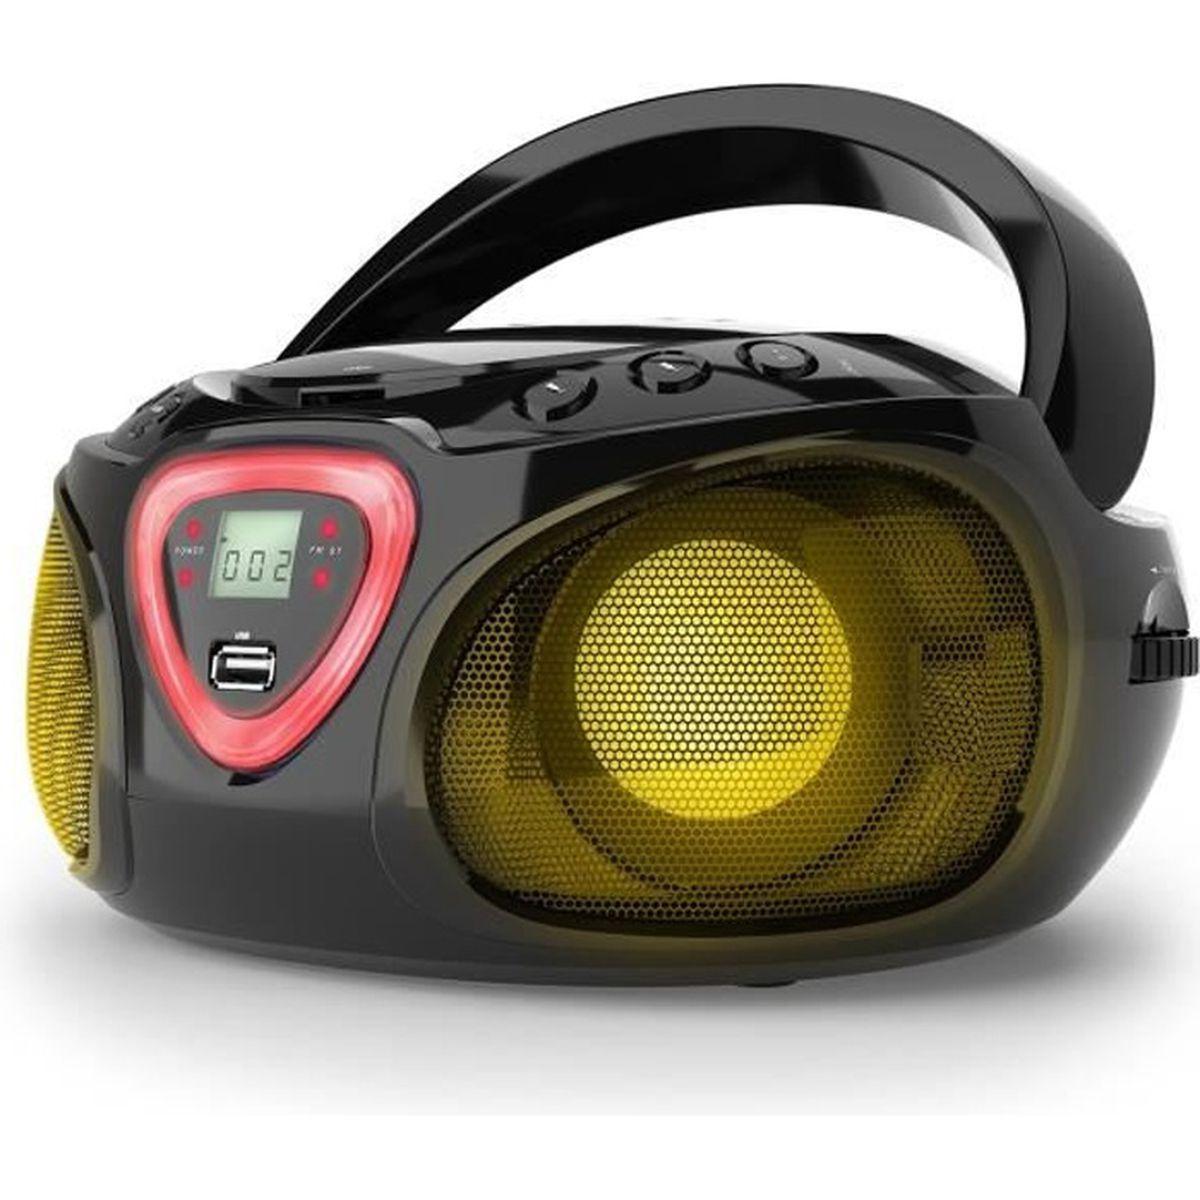 RADIO CD CASSETTE auna Roadie Boombox CD USB MP3 Radio AM-FM Bluetoo